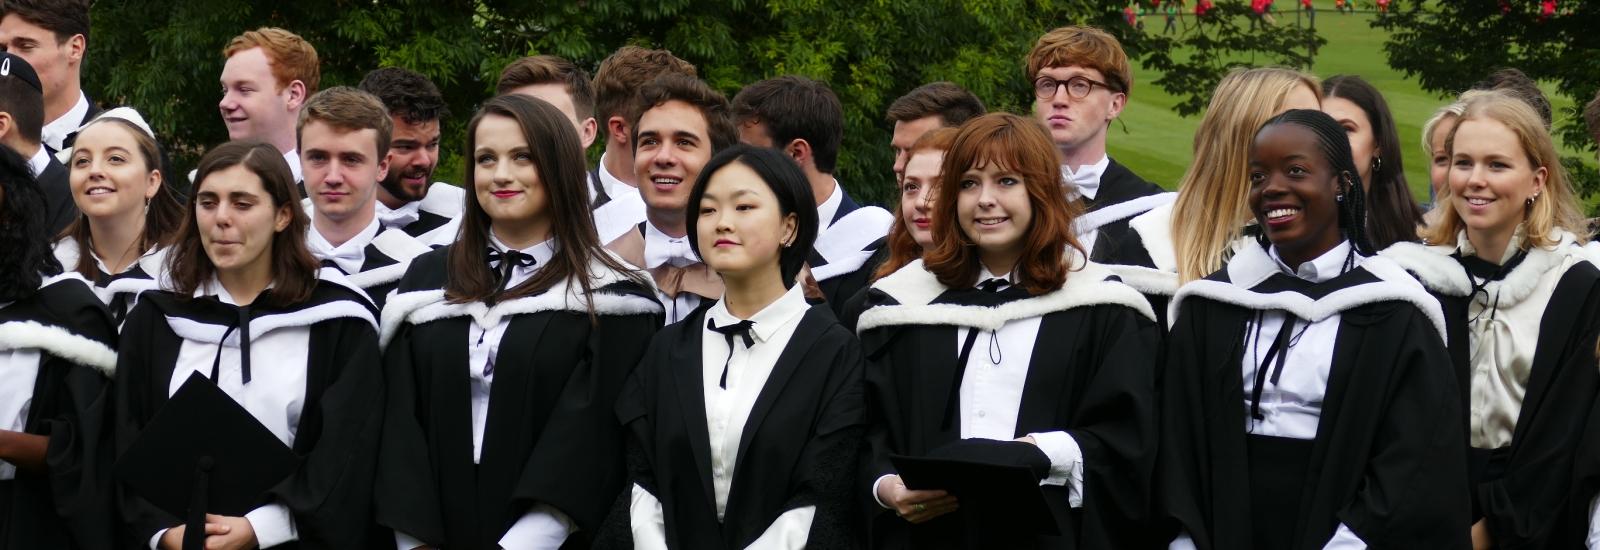 New graduates following their graduation ceremony